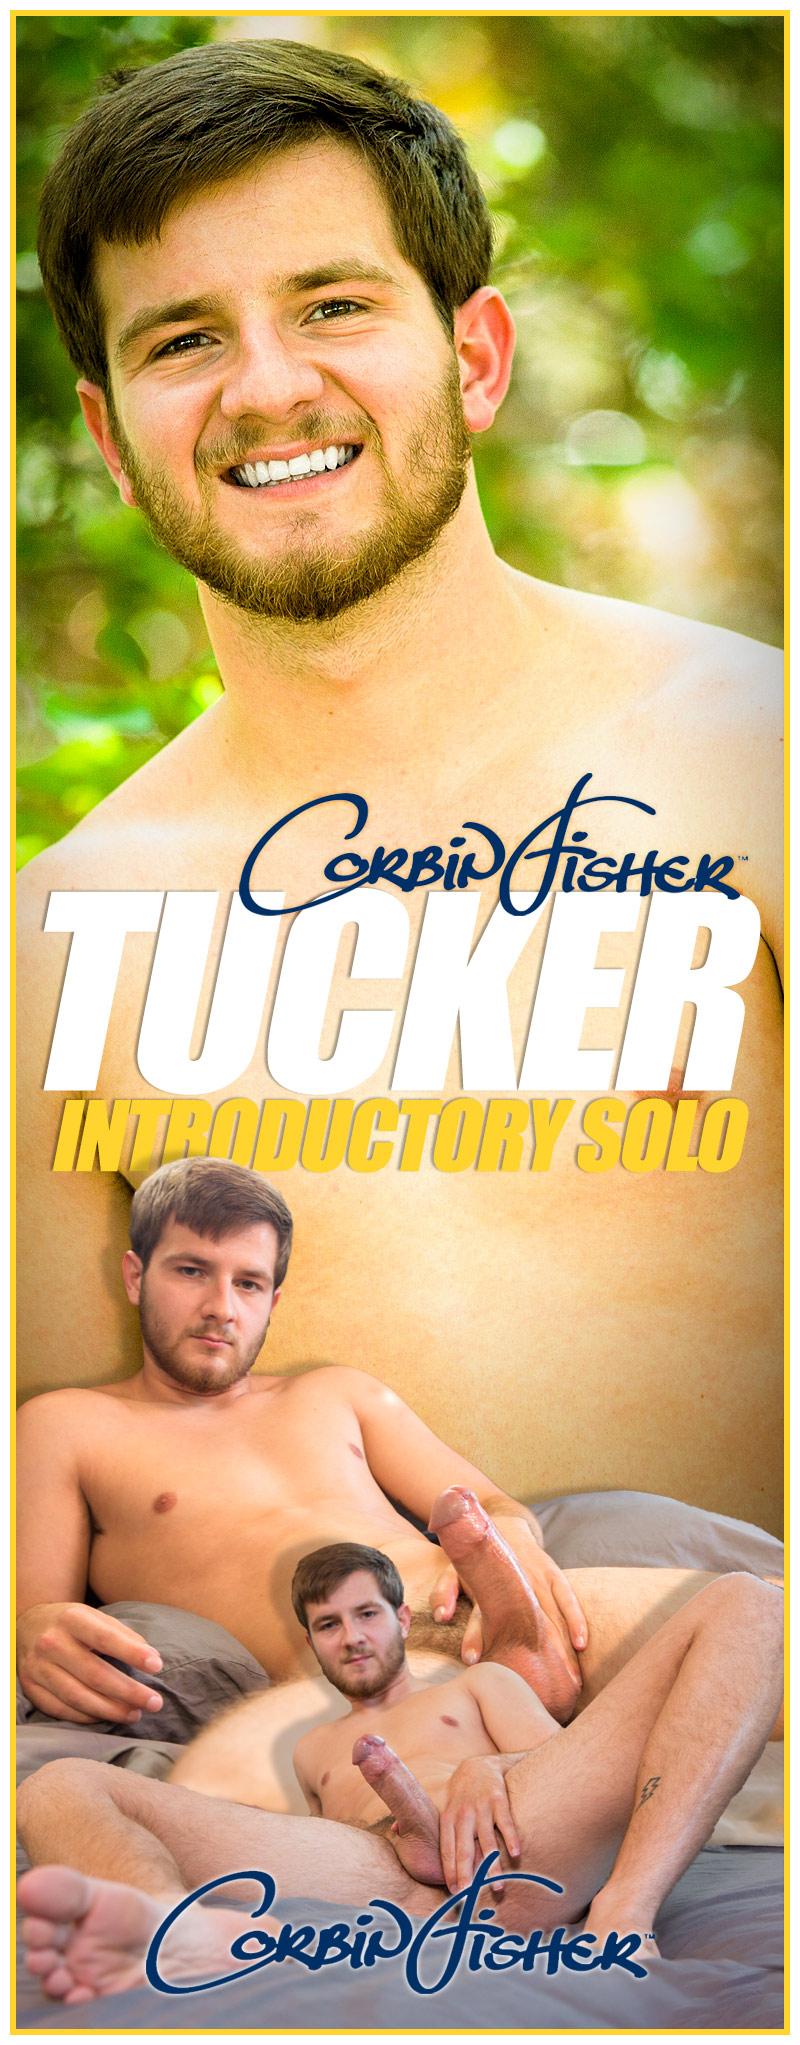 Tucker II at CorbinFisher